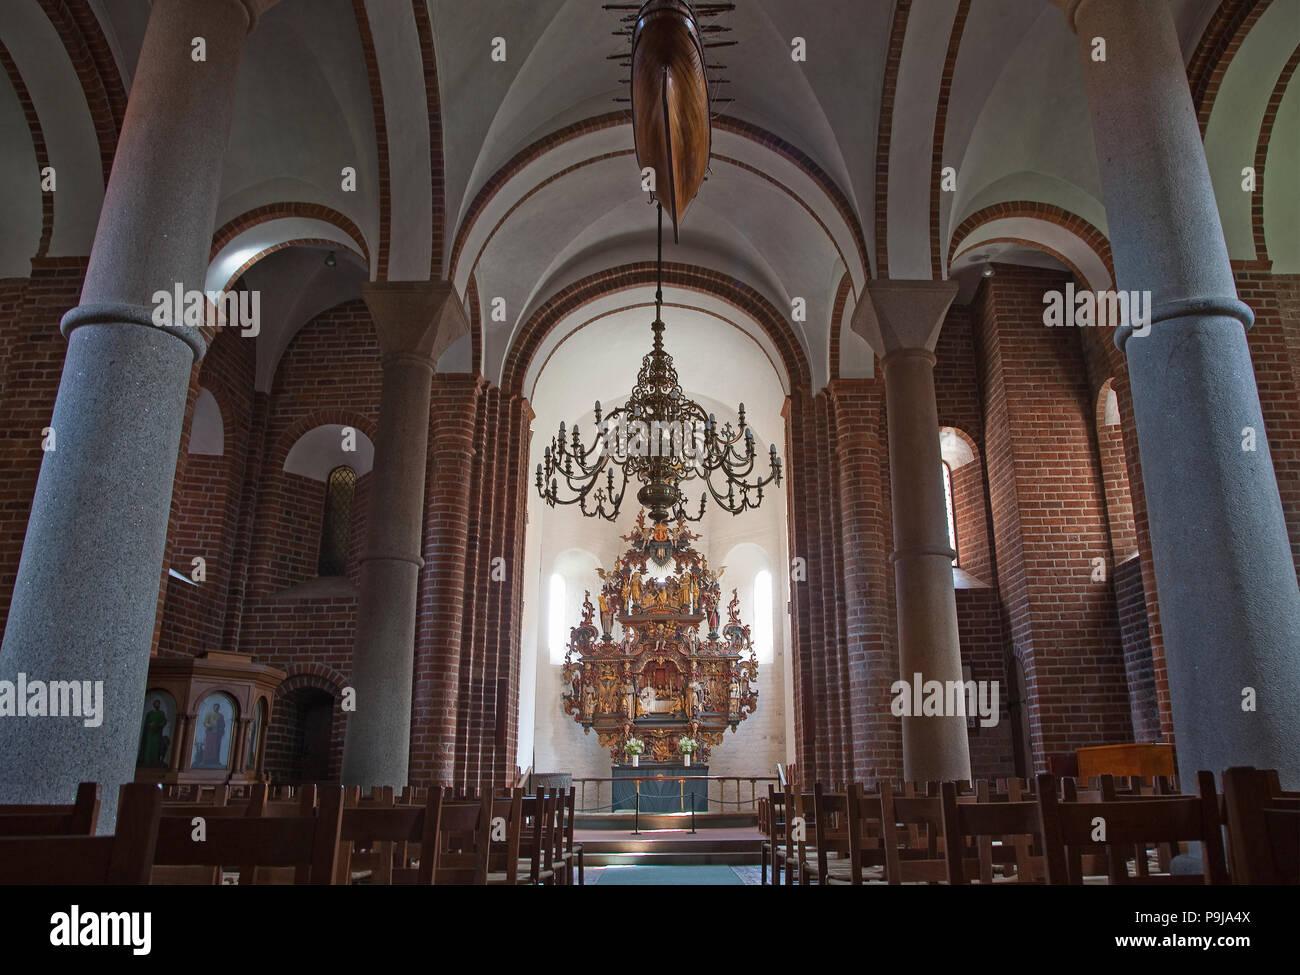 Inside Our Lady church in Kalundborg, Denmark. - Stock Image